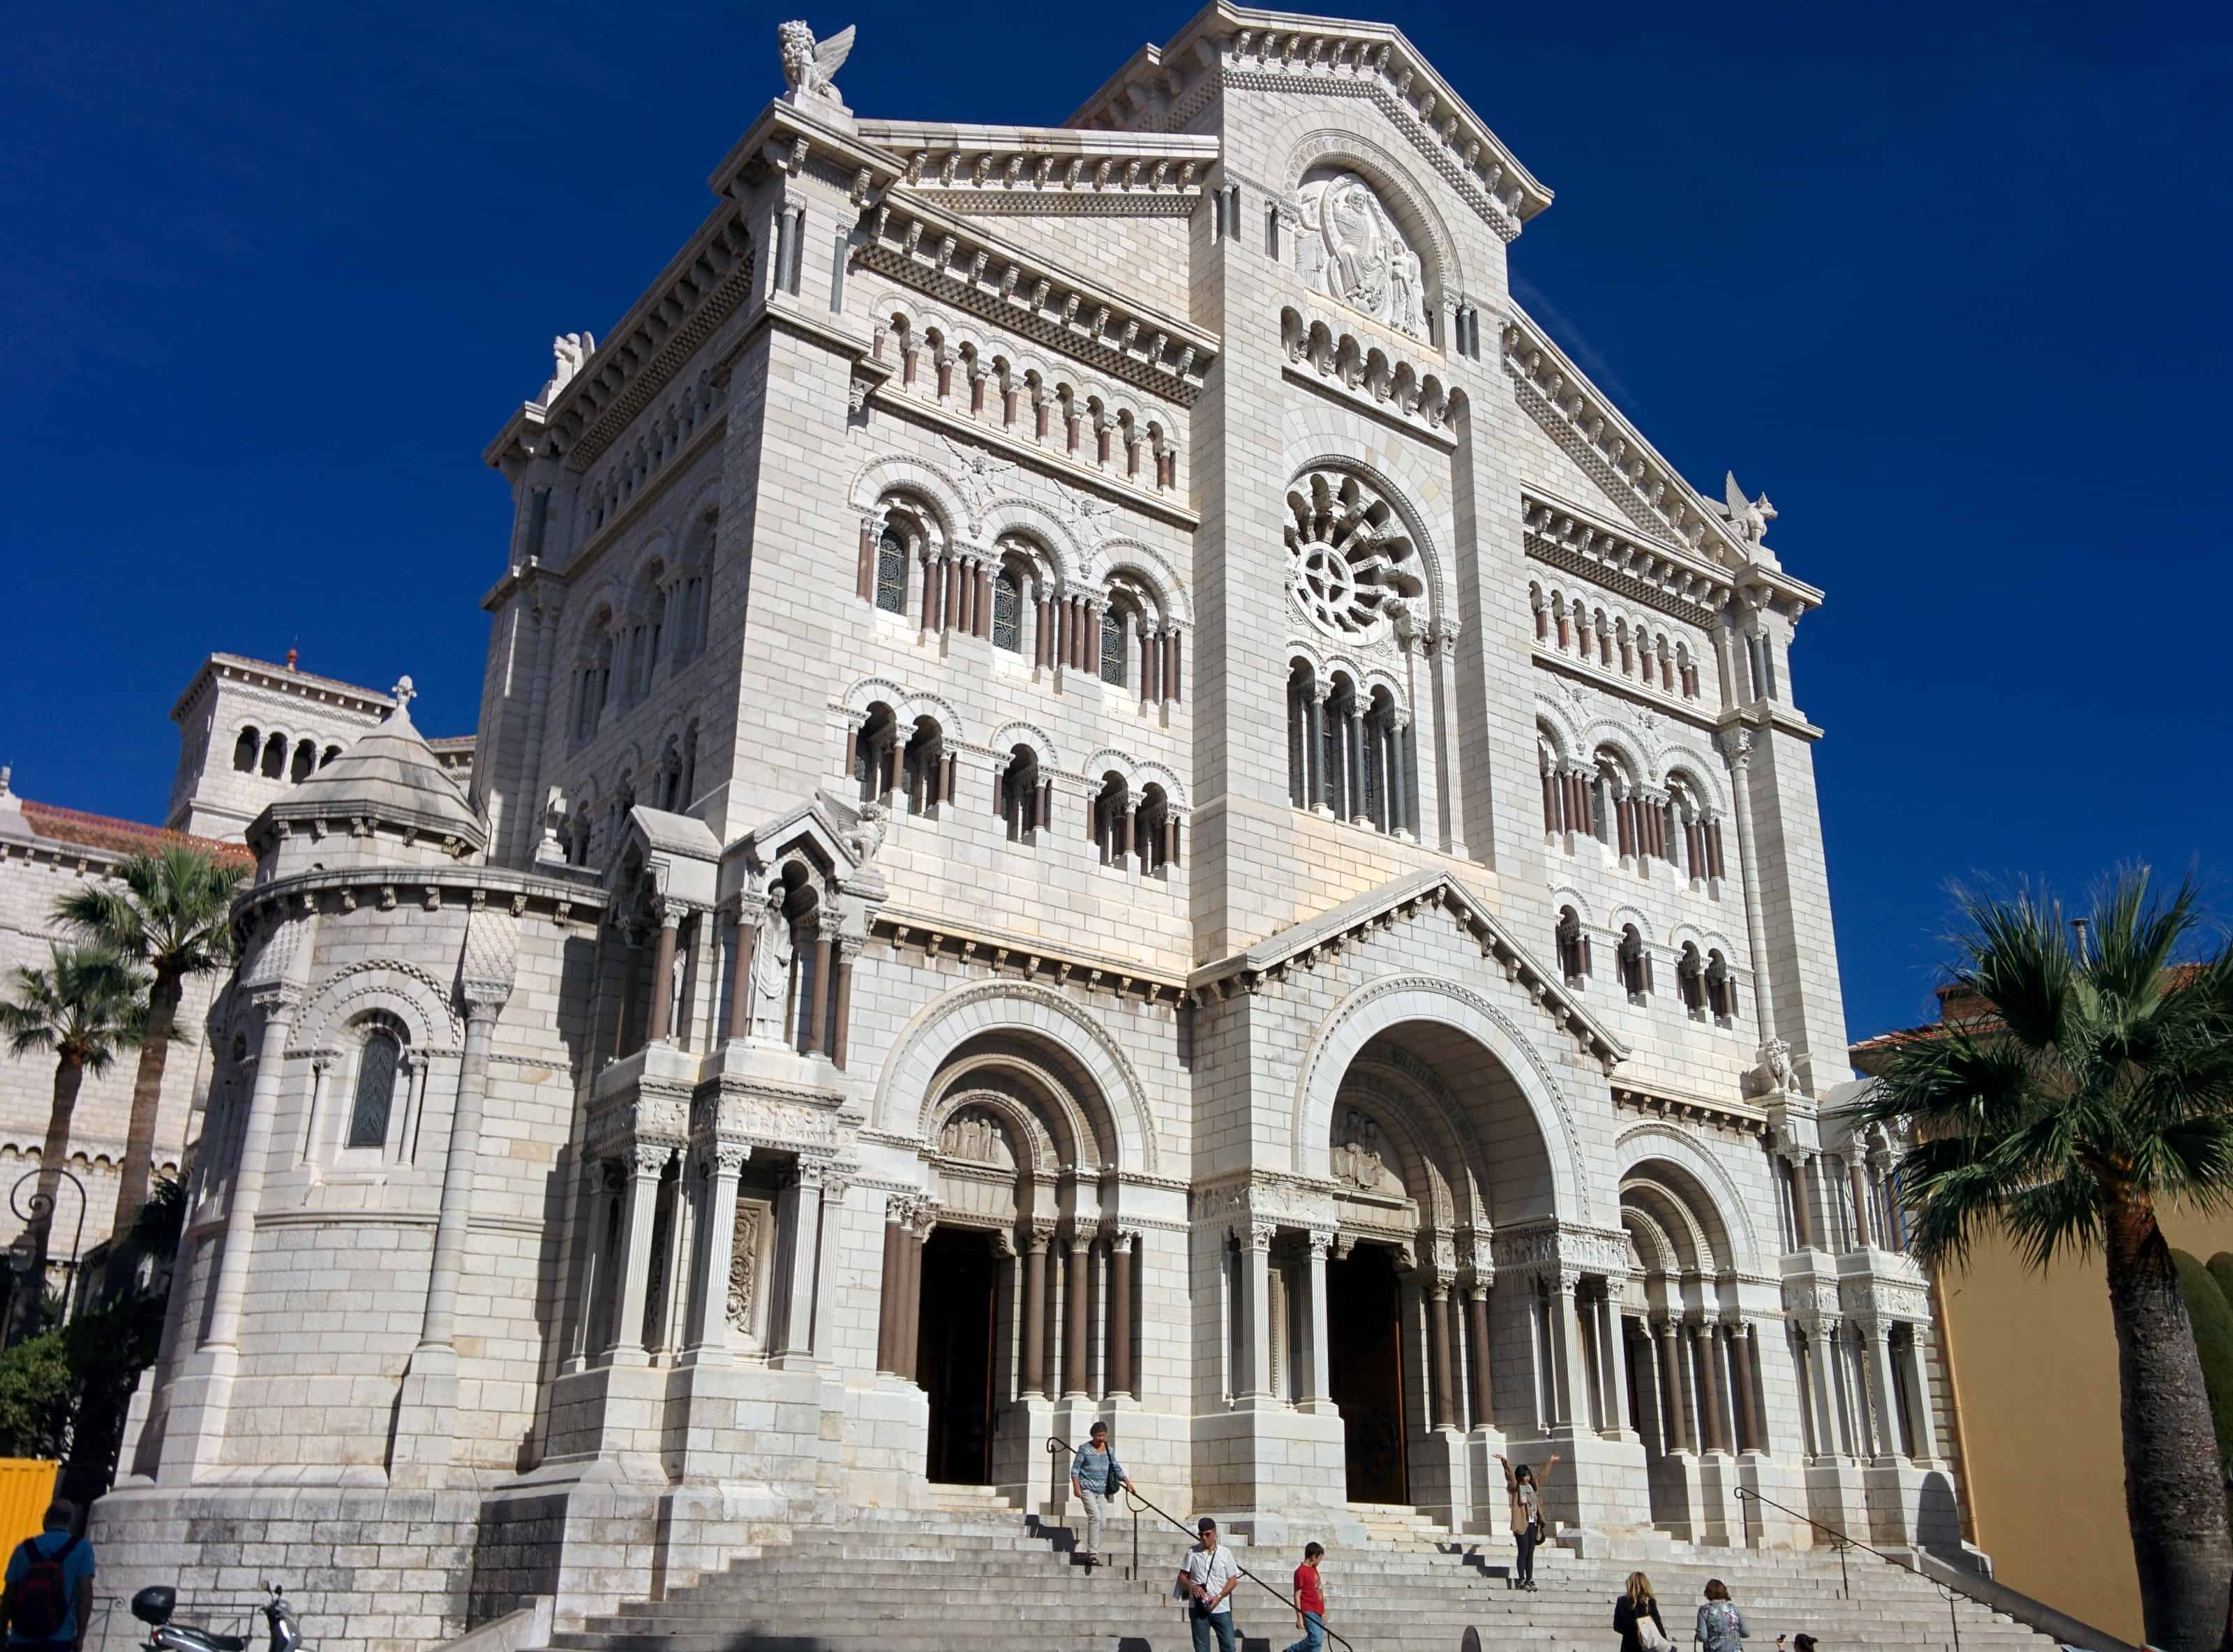 Monaco Cathedral - Reasons to Visit Monaco